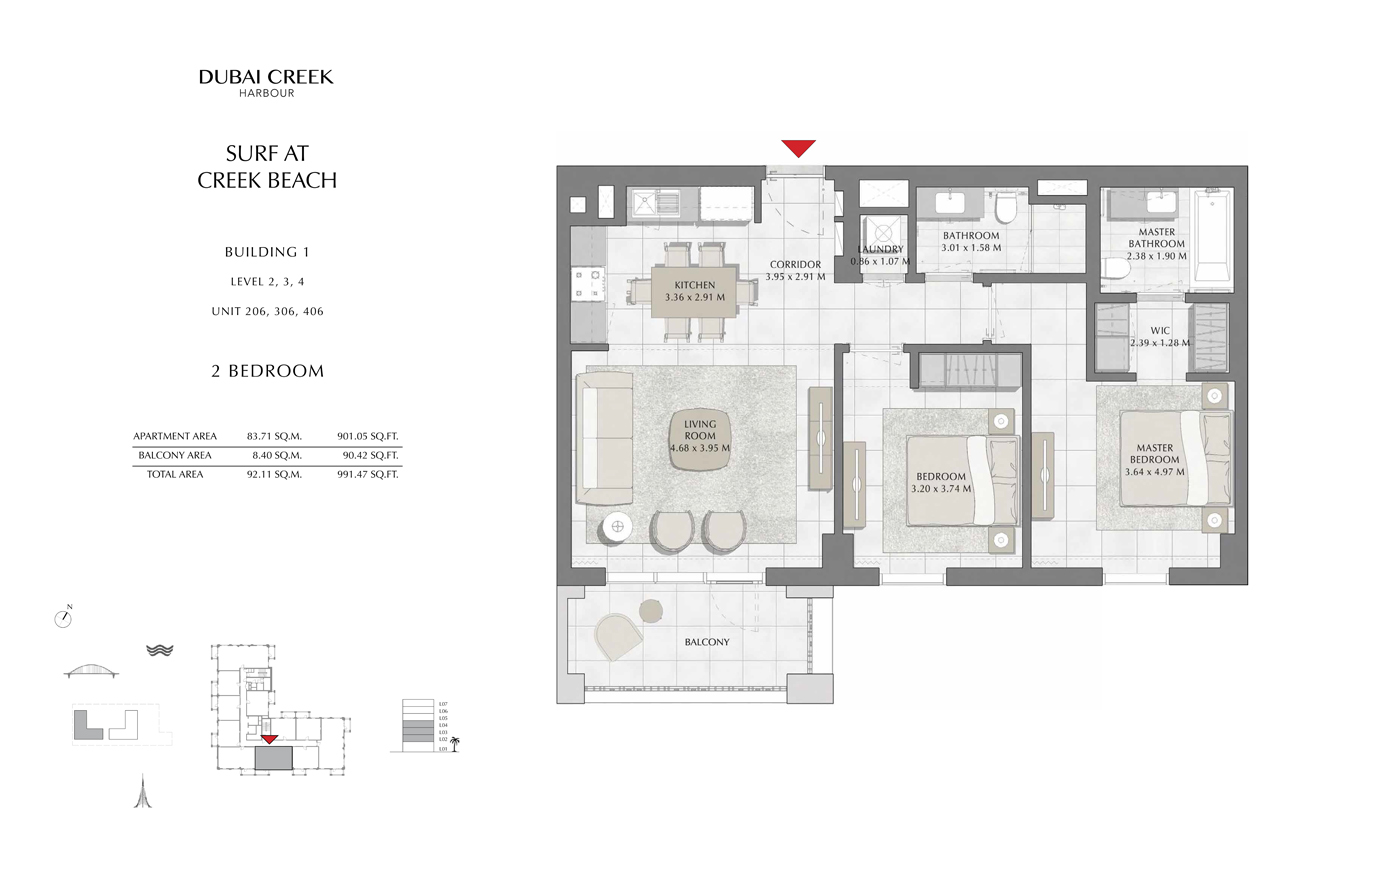 Building 1, 2 Bedroom, Level 2, 3, 4, Size 991 Sq Ft